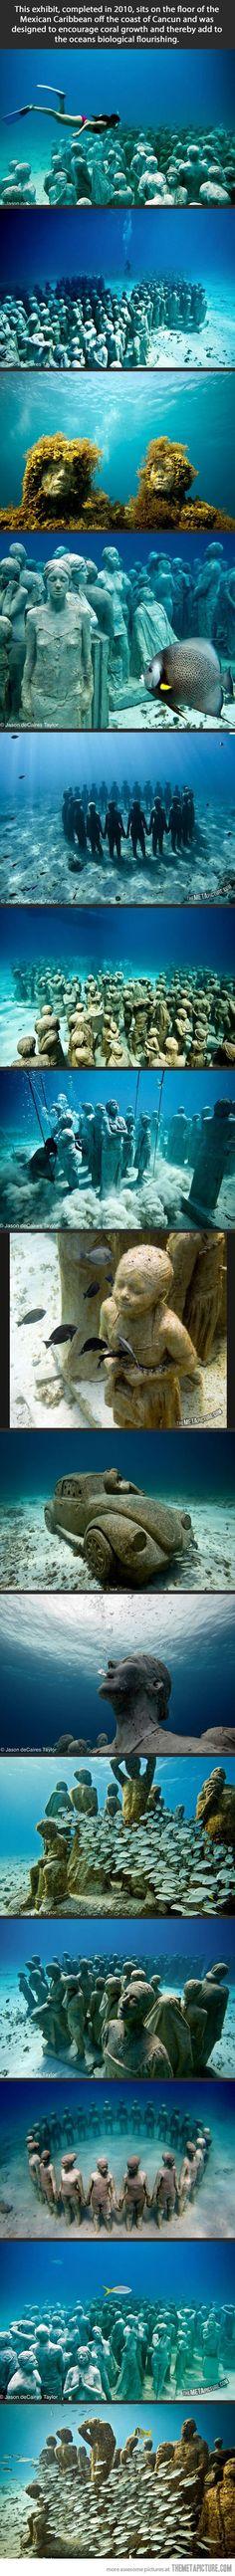 Amazing underwater museum… http://trickphotographybook.com/?hop=shopper64